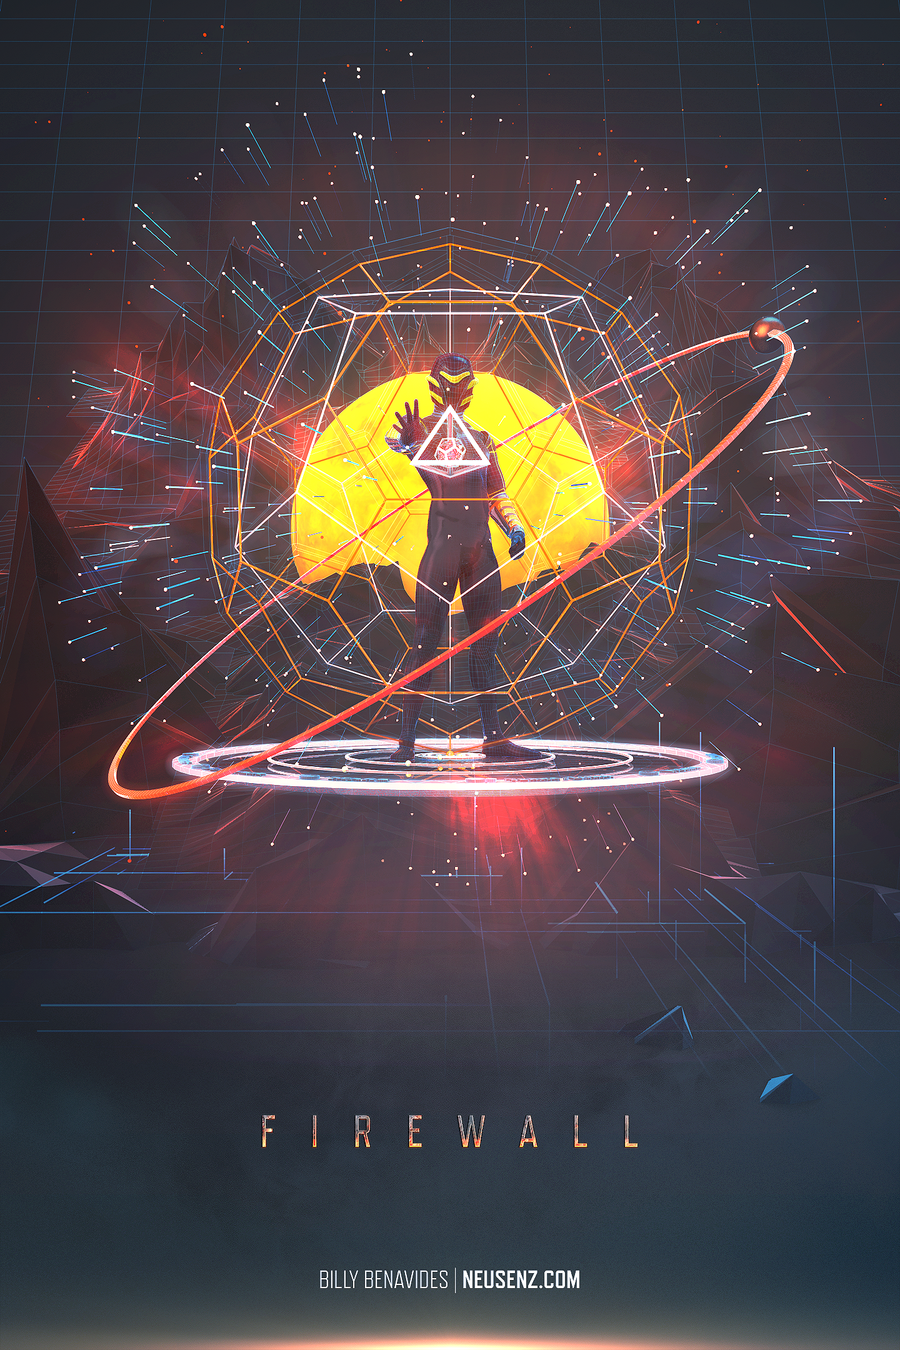 Firewall by neutrix